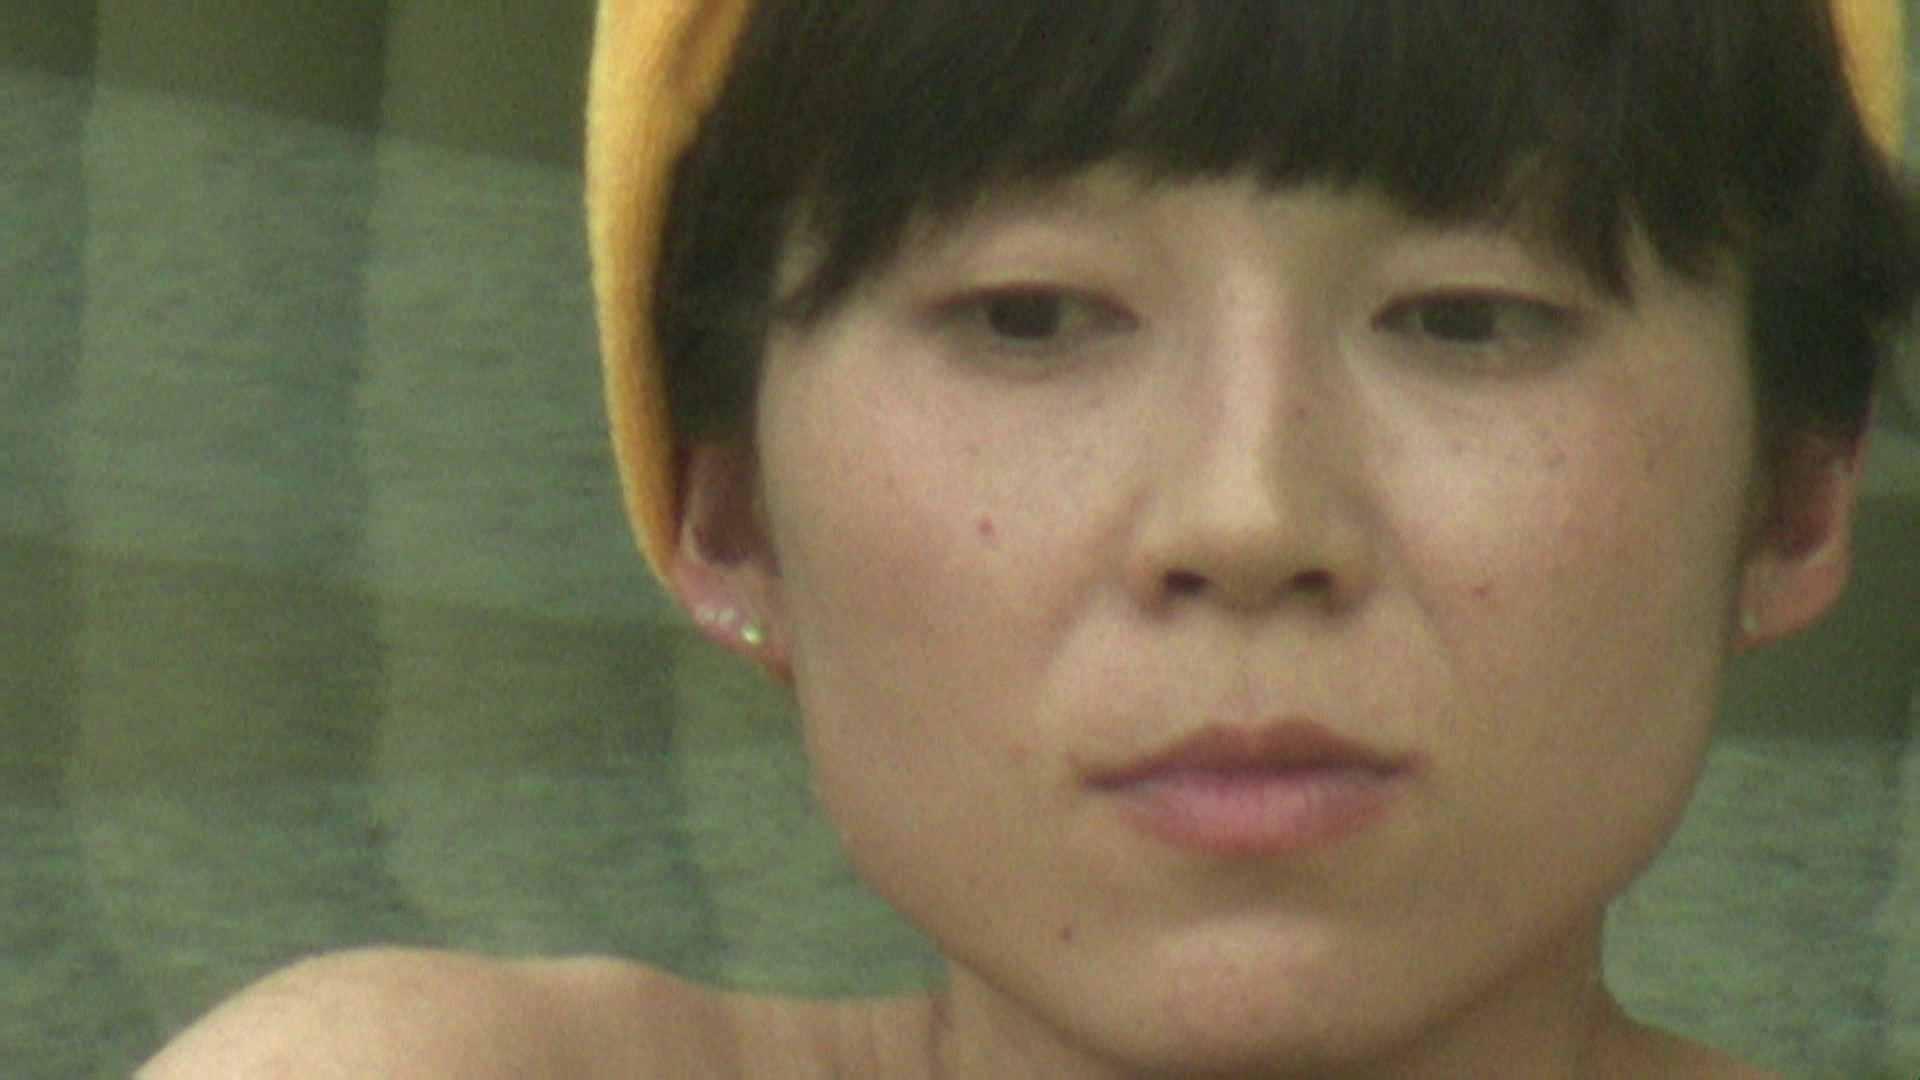 Aquaな露天風呂Vol.633 盗撮特撮 のぞき動画画像 10pic 2